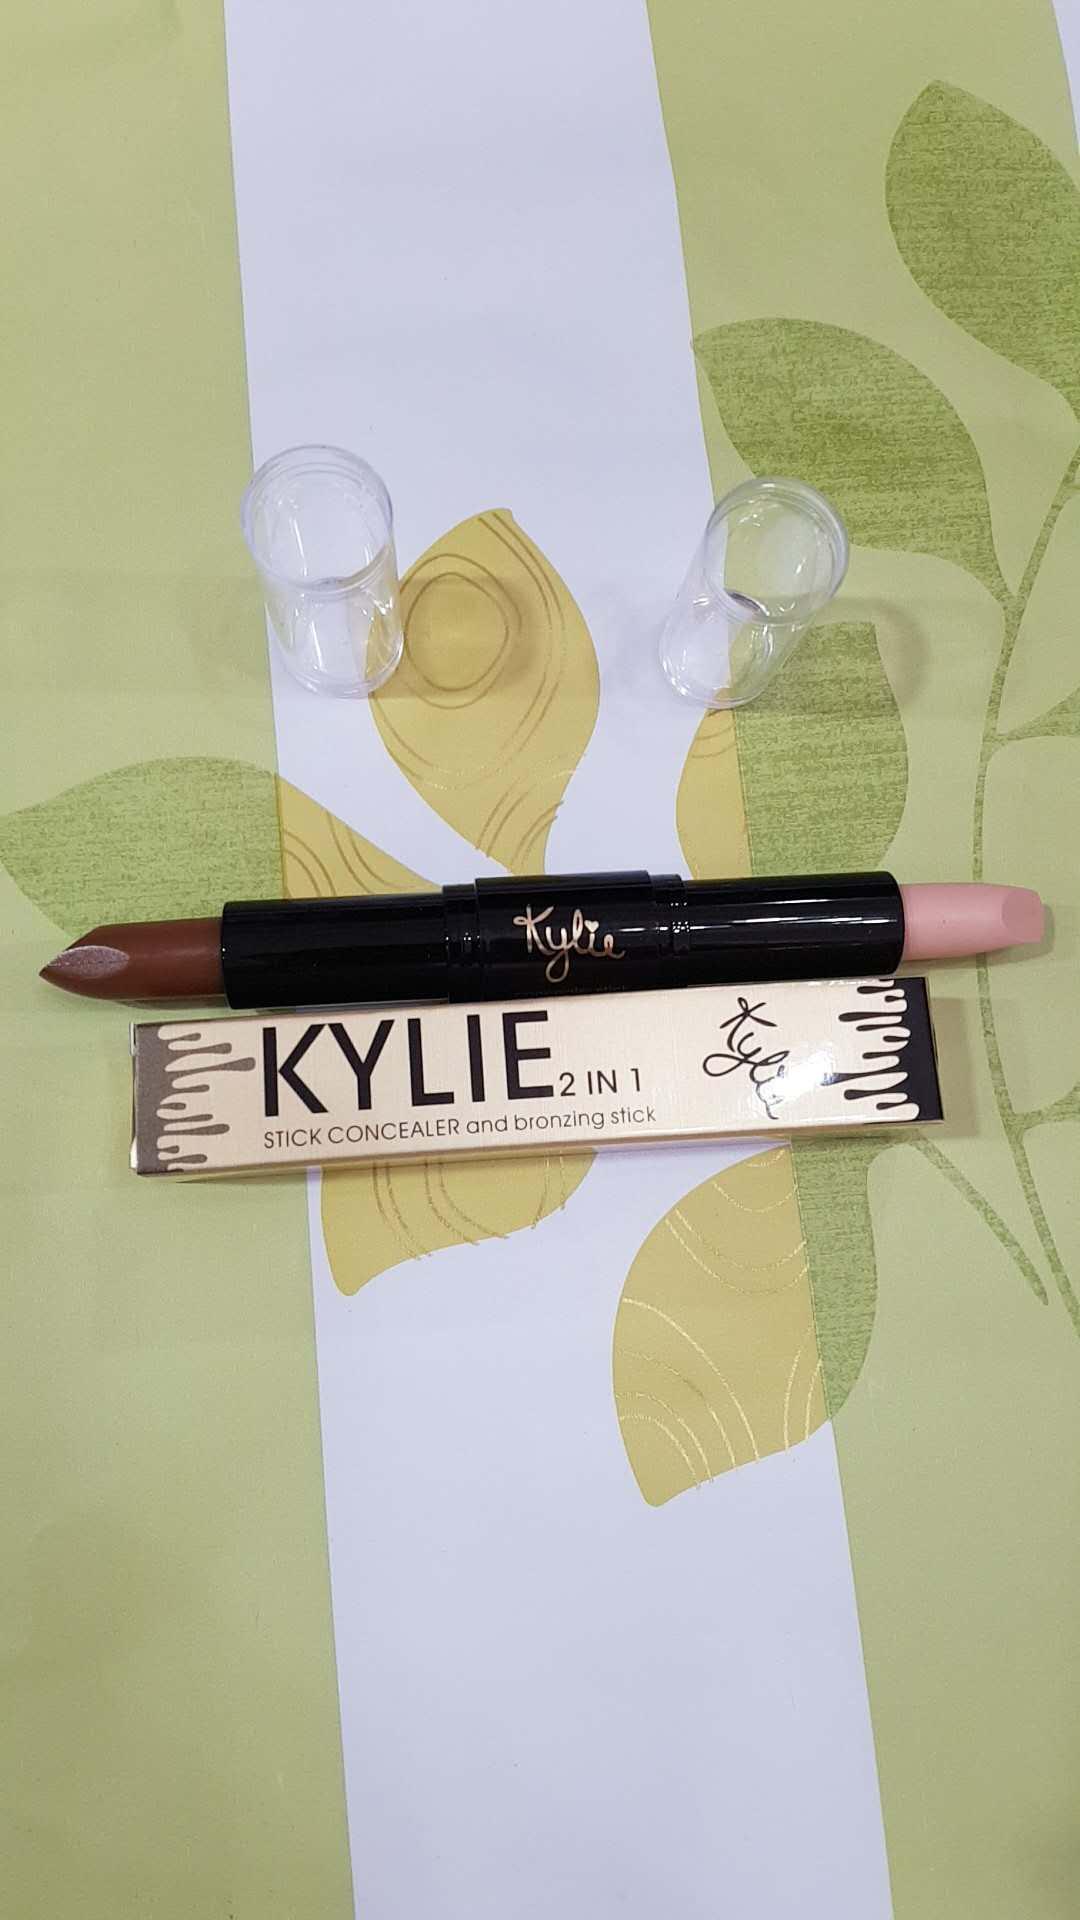 KYLIE- stick concealer and bronzing stick-04 Philippines